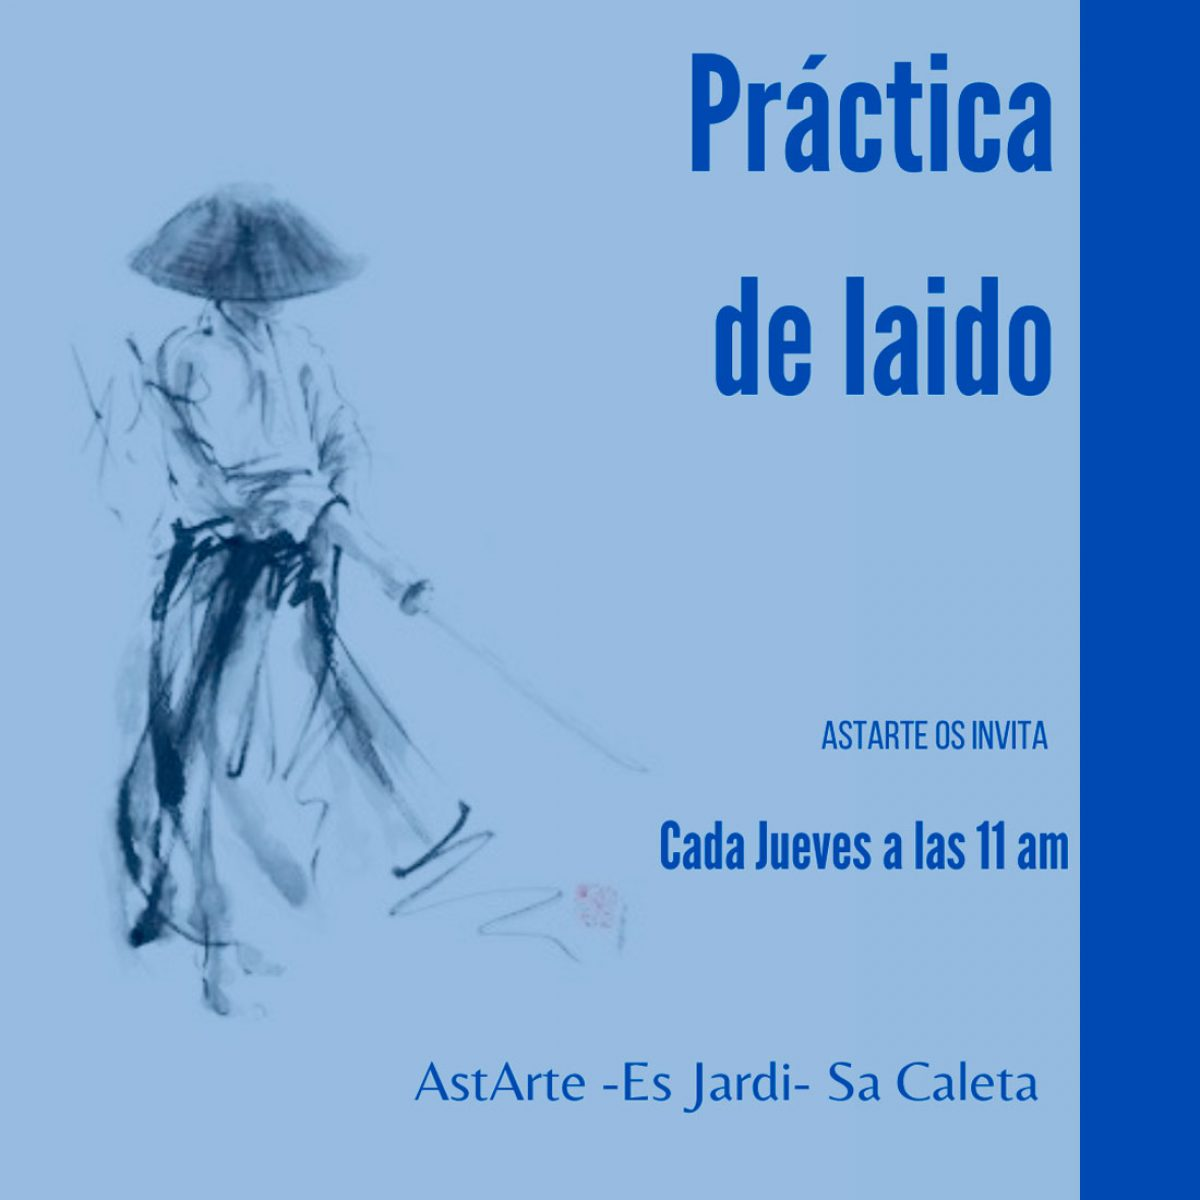 astarte-es-jardi-sa-caleta-ibiza-practices-iaido-ibiza-2021-welcometoibiza